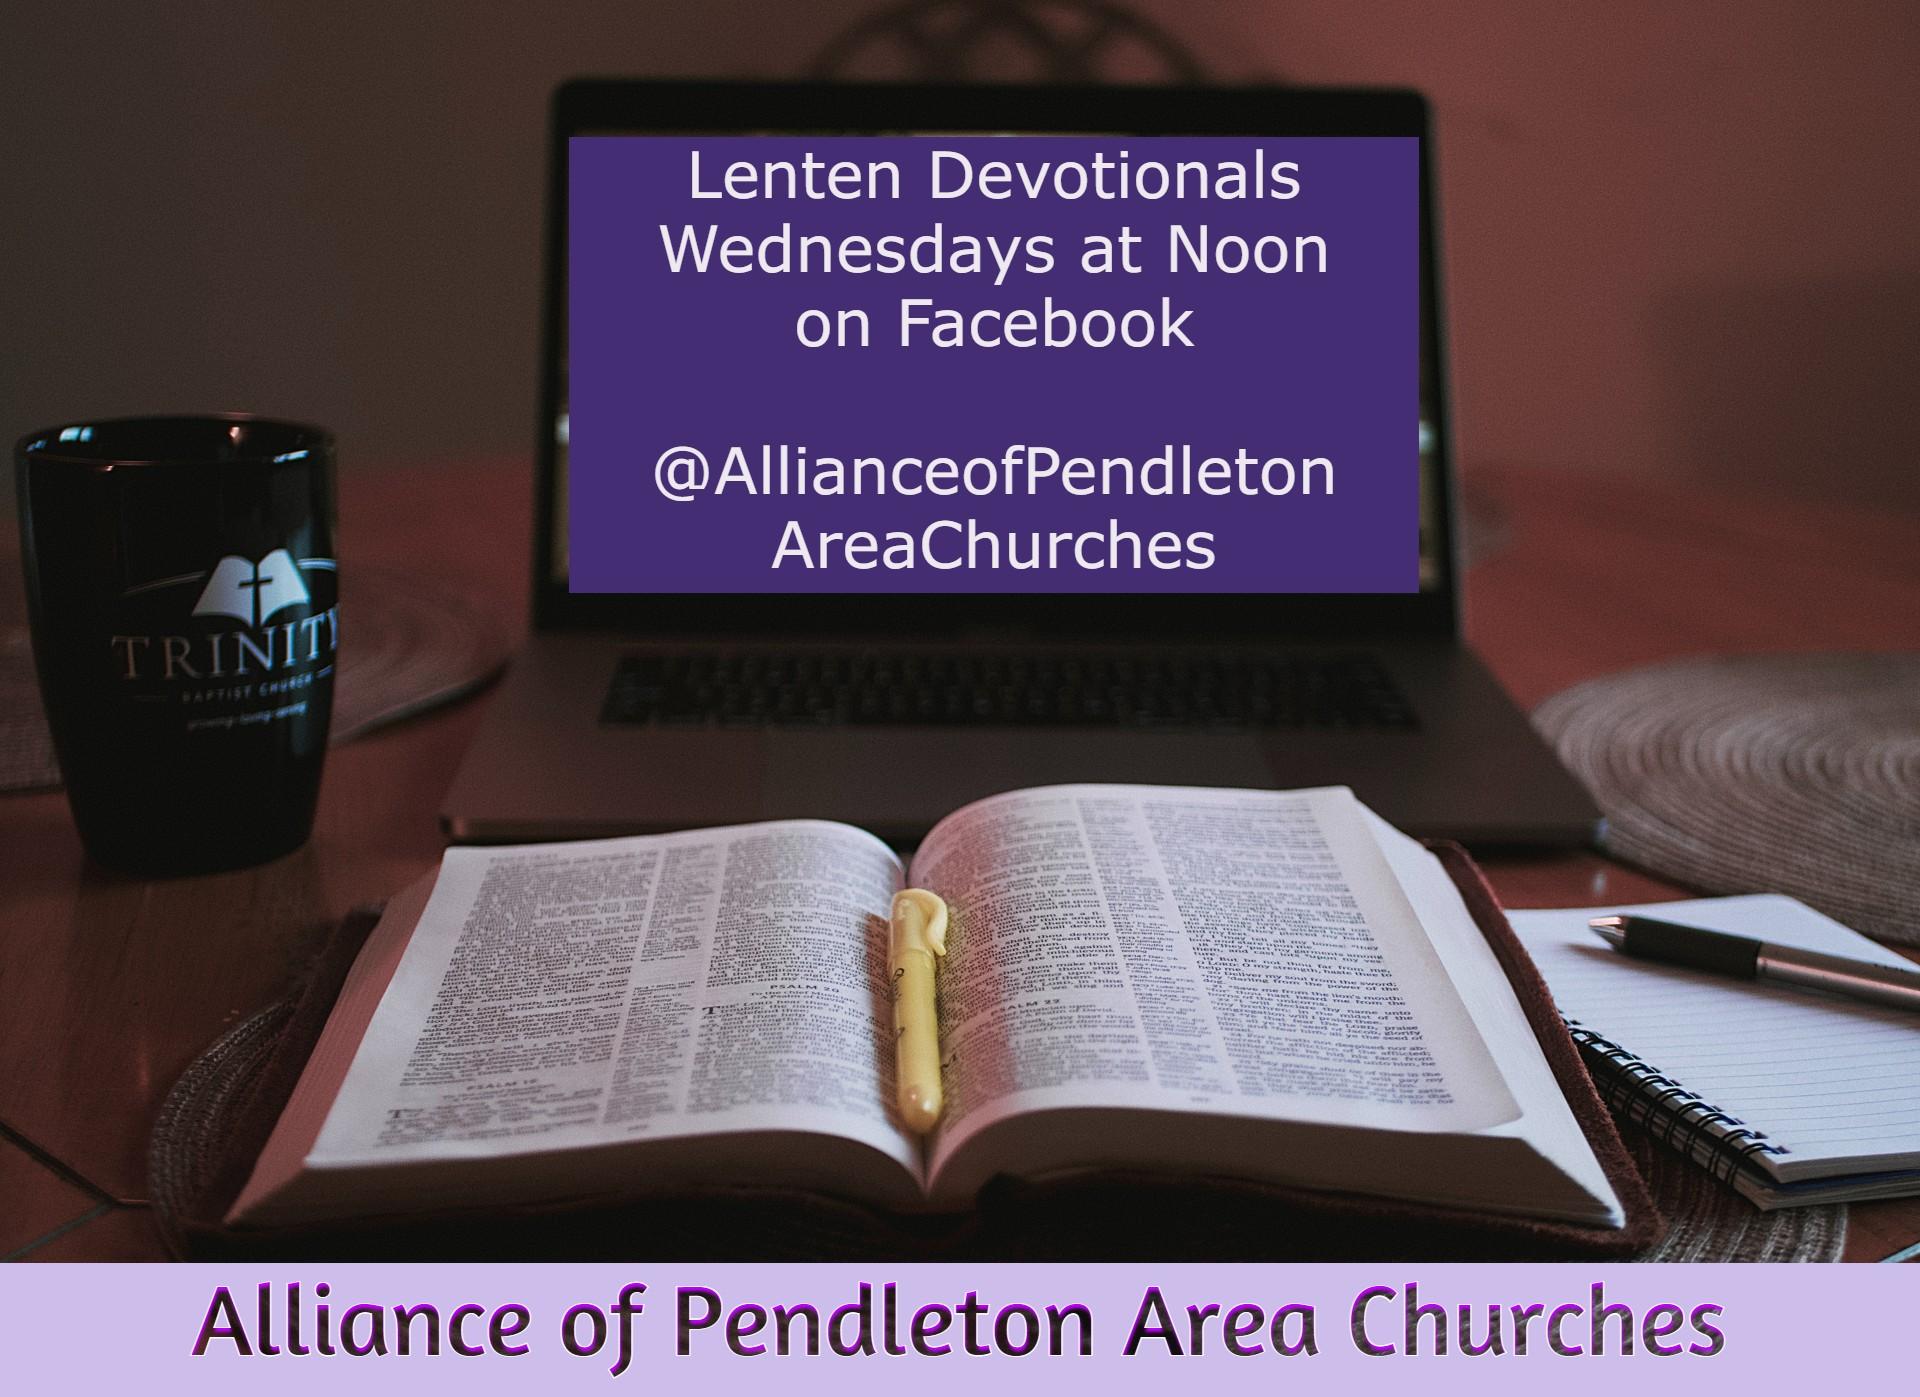 APAC Lenten Devotionals on Facebook